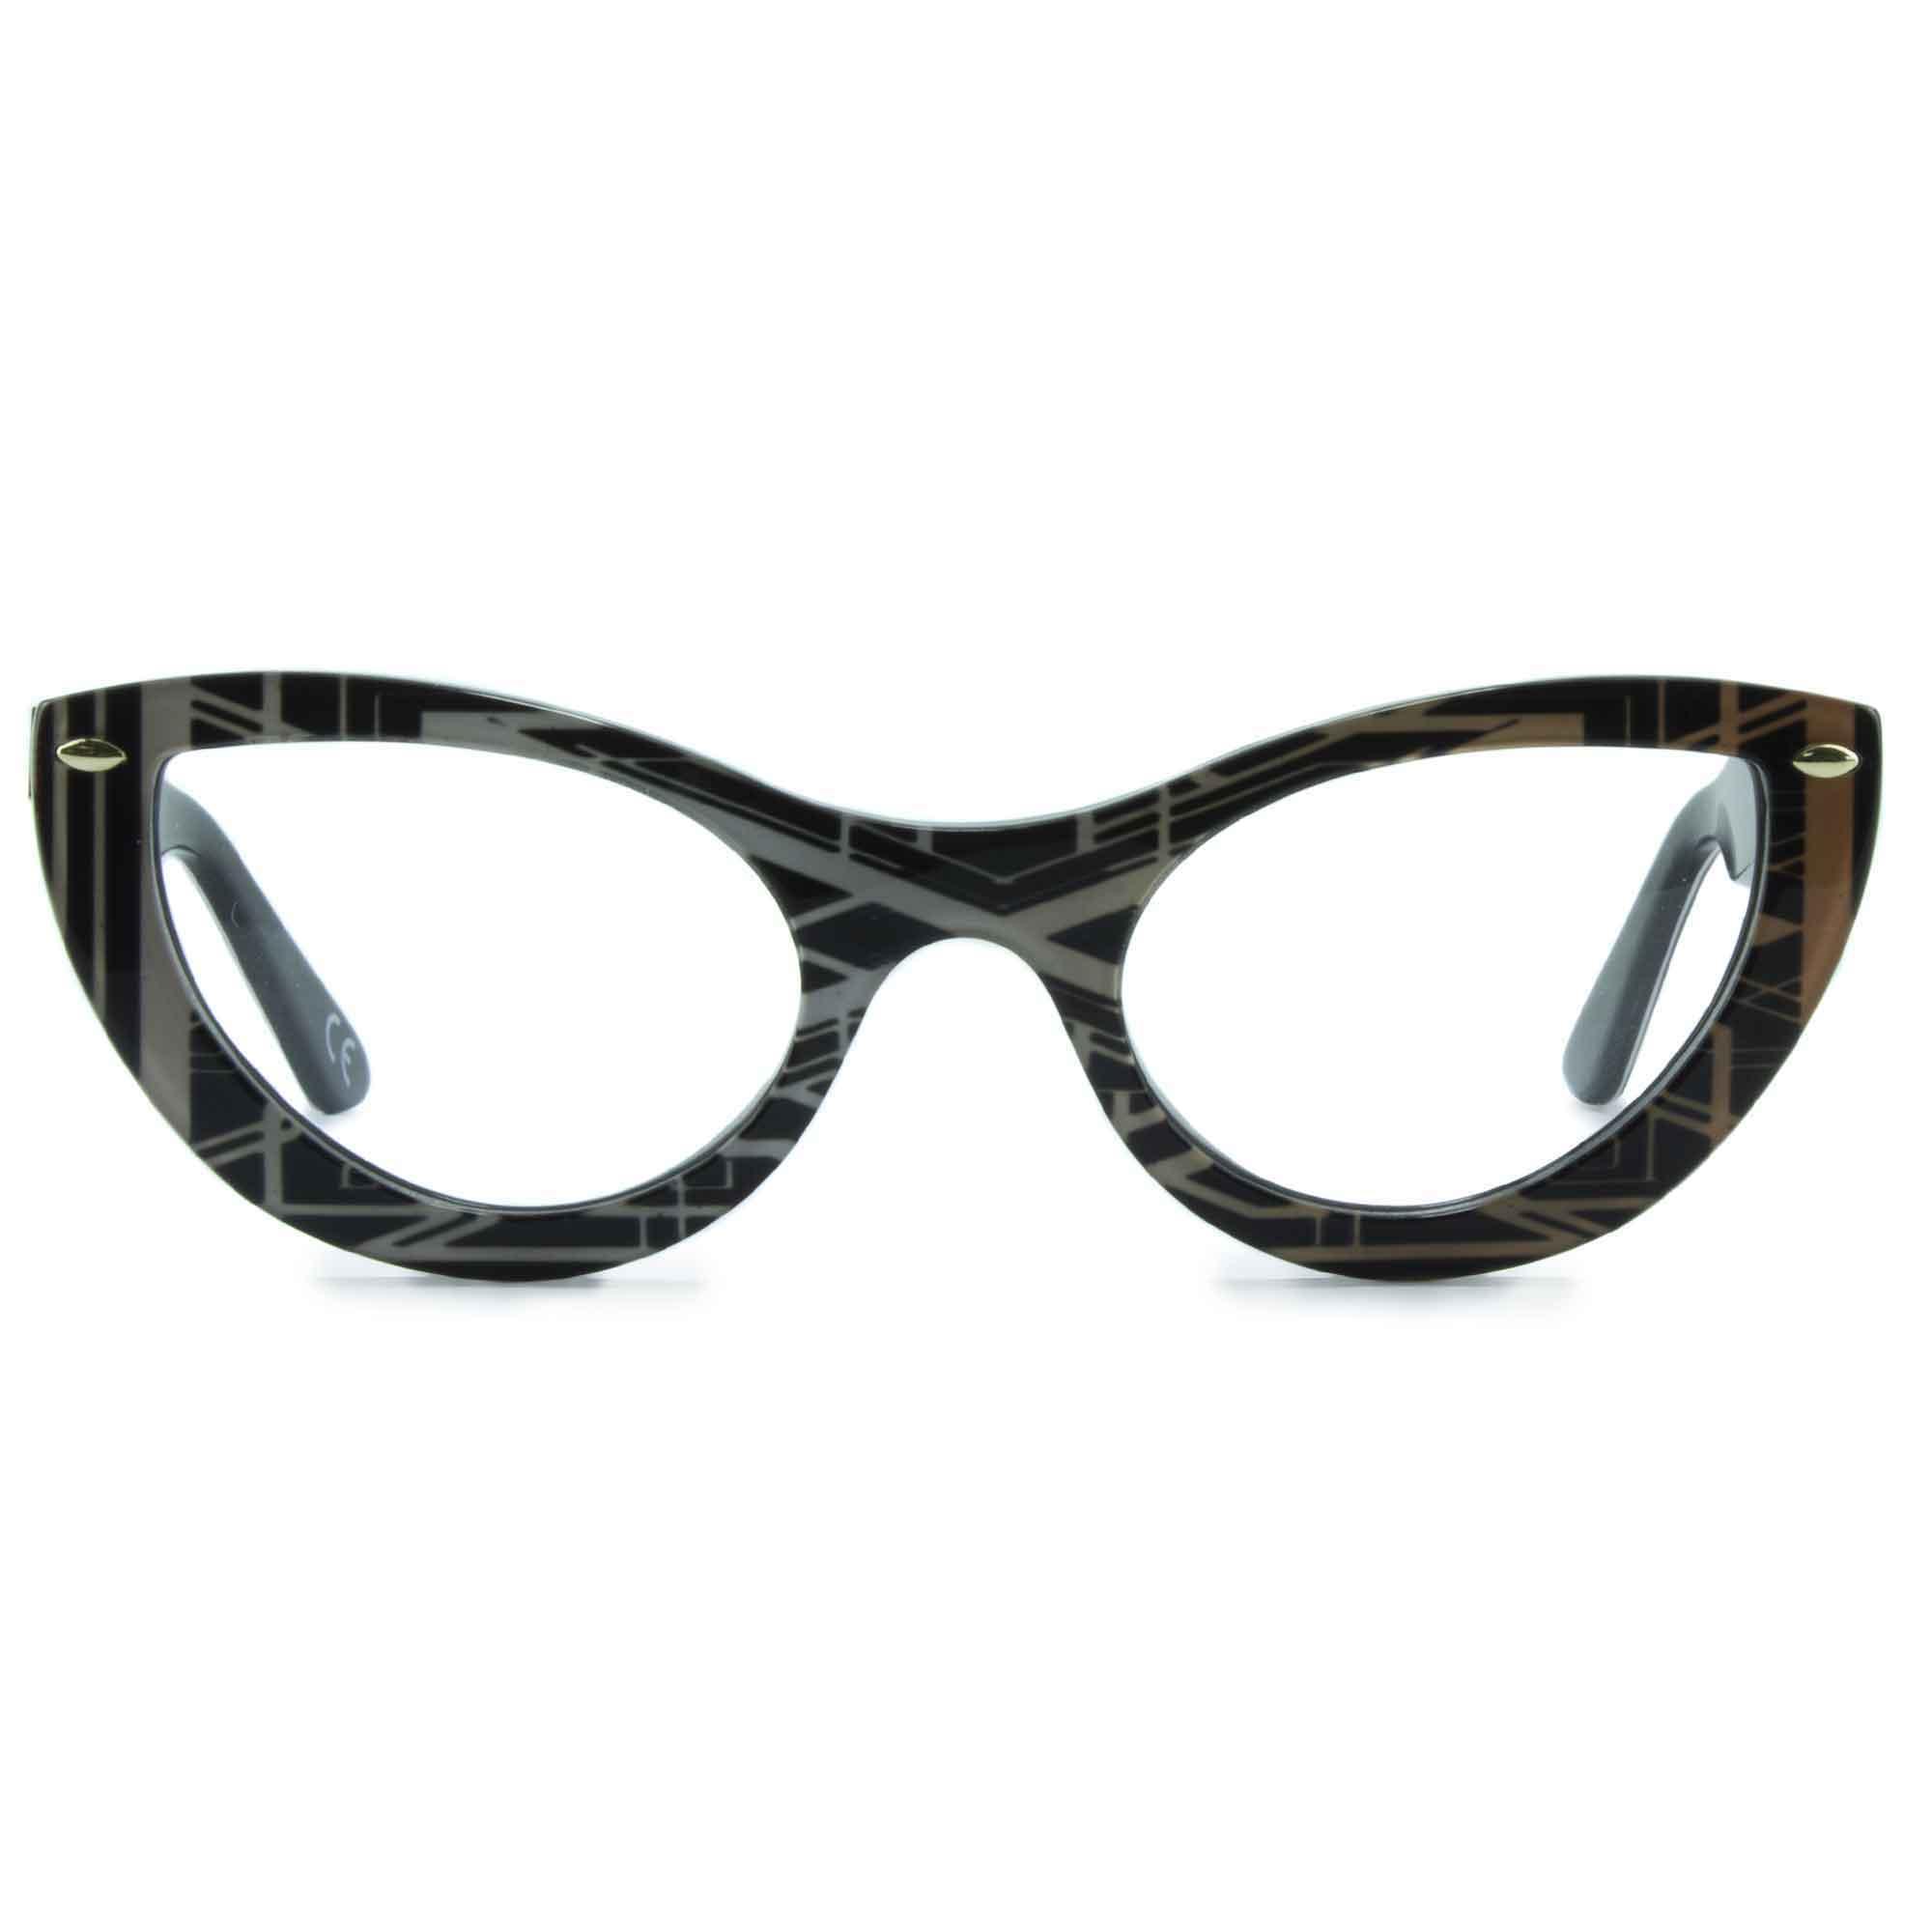 Joiuss gatsby black & gold cat eye glasses